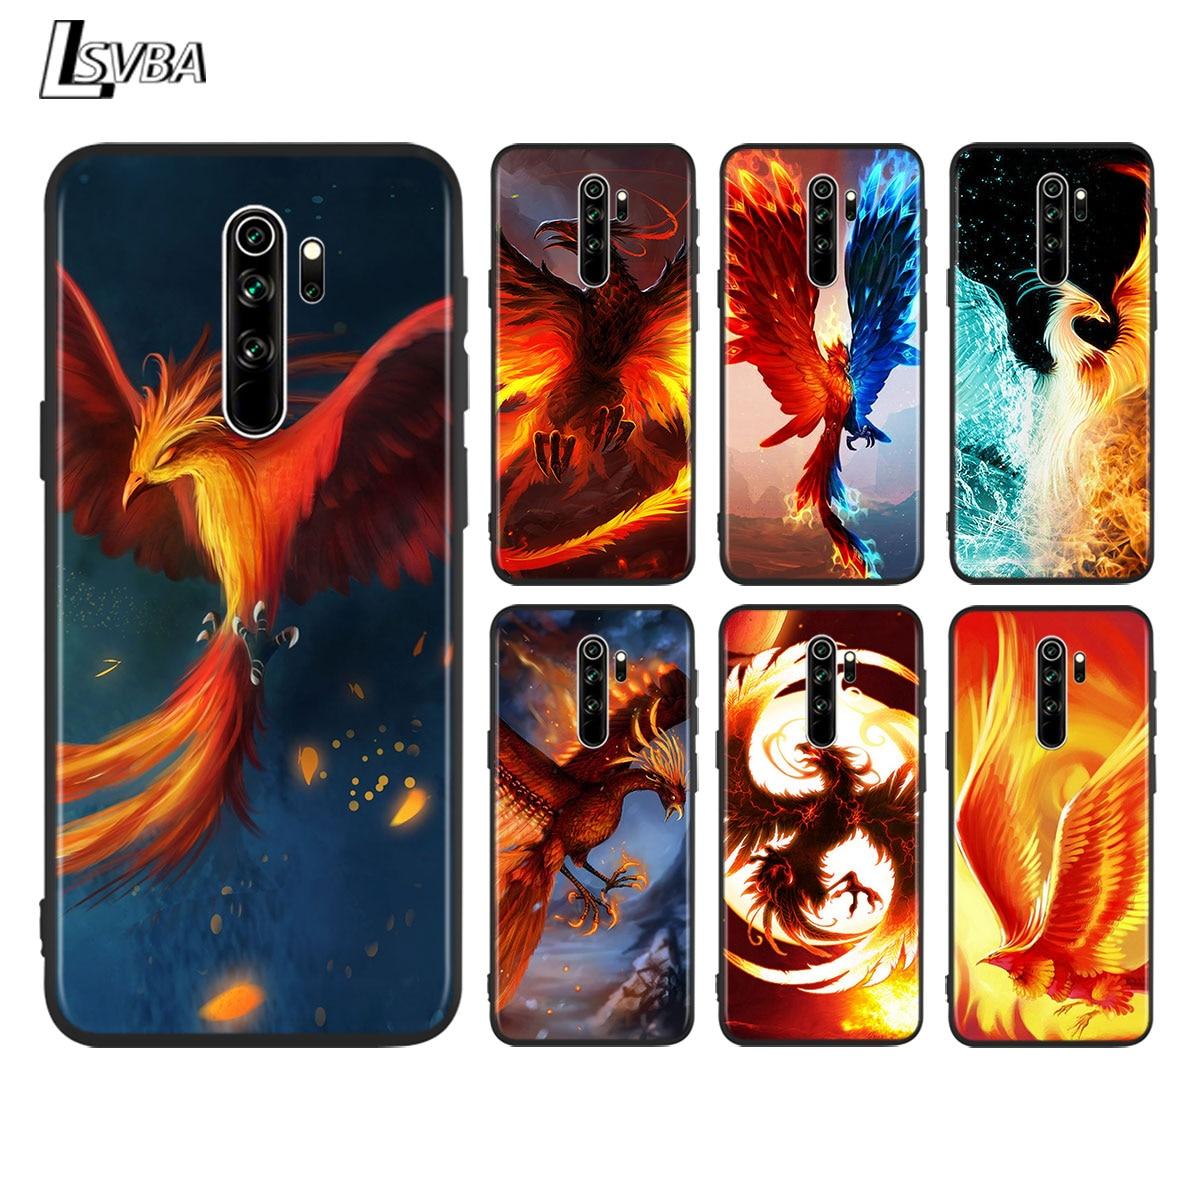 Magia Phoenix para Xiaomi Redmi 10X 5G 9i 9C 9A 9 primer ir K20 K30 Ultra 8A 8 7A 7 S2 6A 6 4X brillante Negro teléfono caso